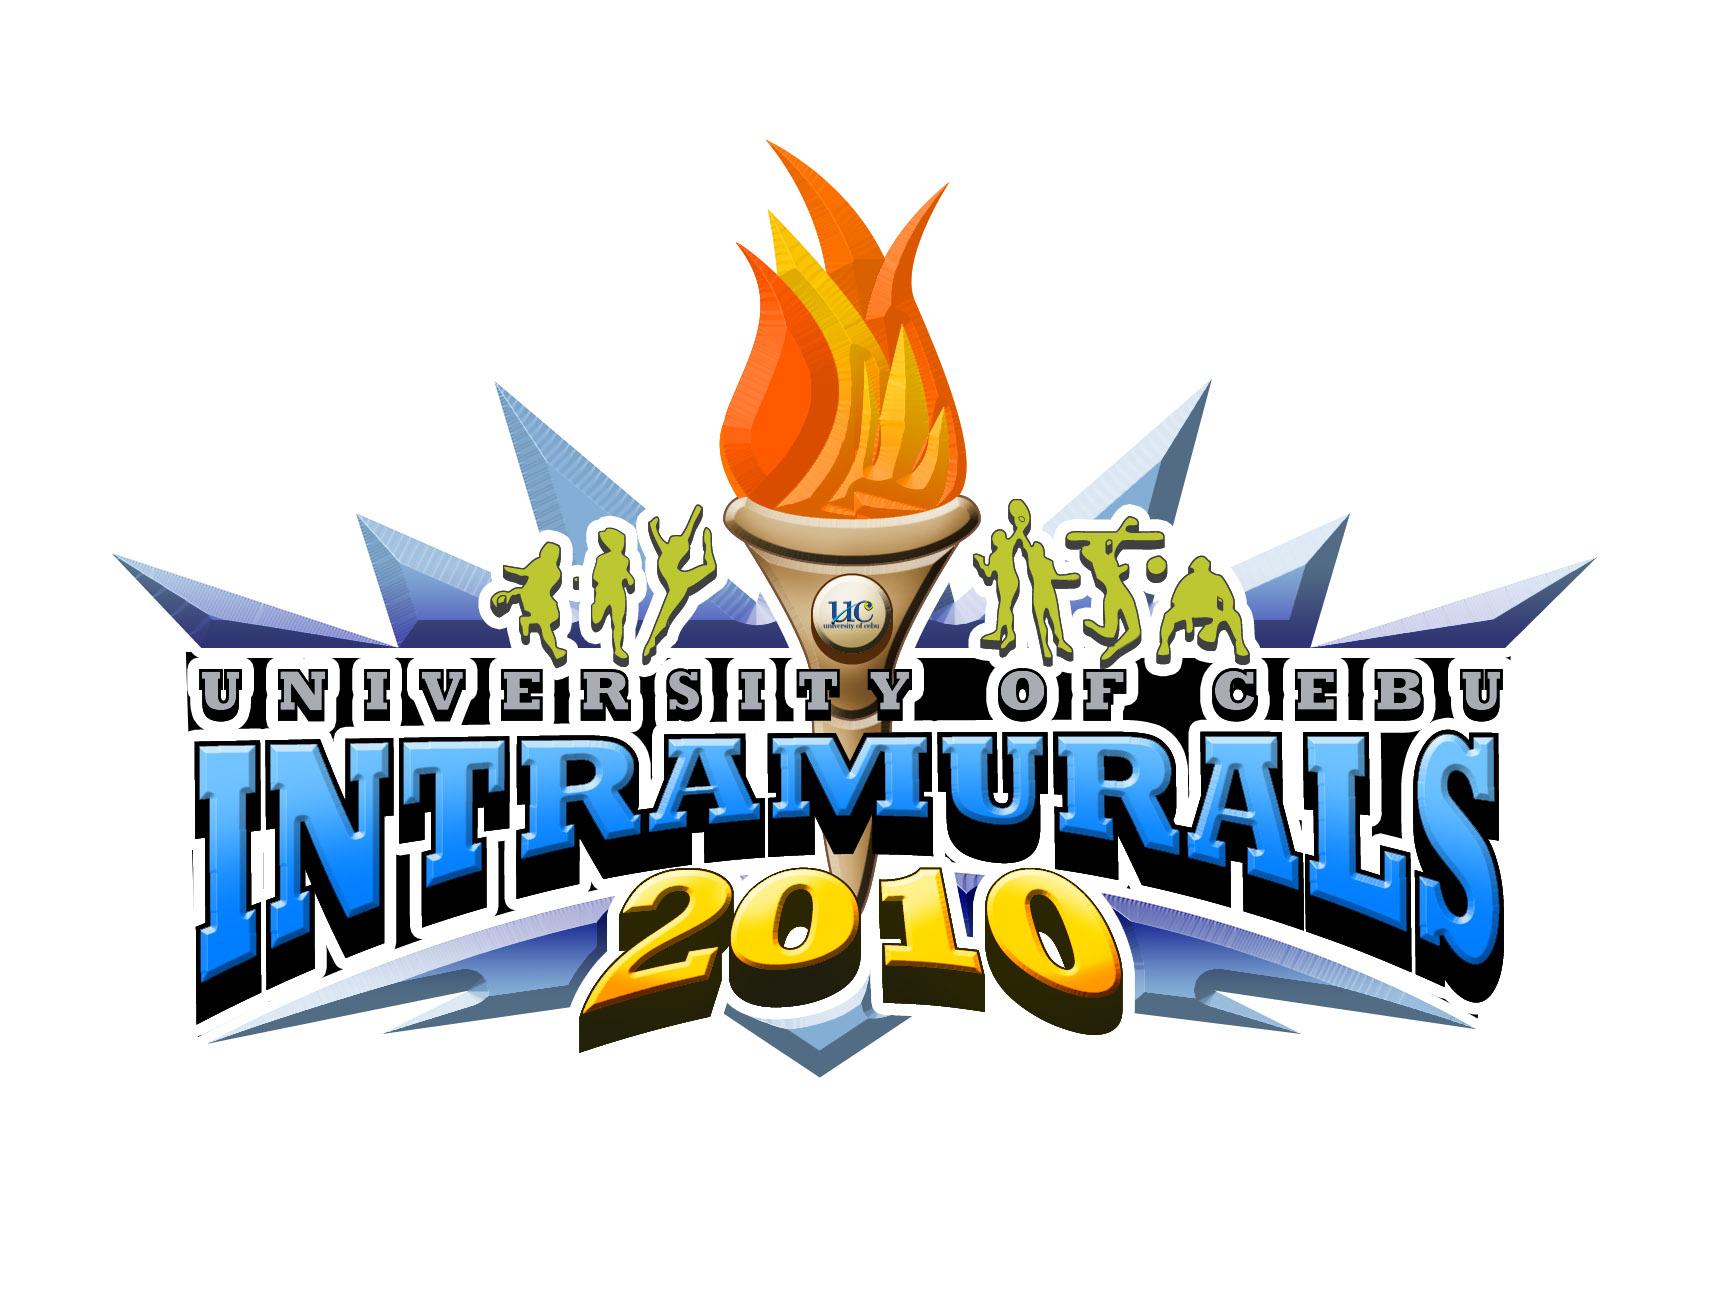 Intramurals TShirt Designs  Designs For Custom